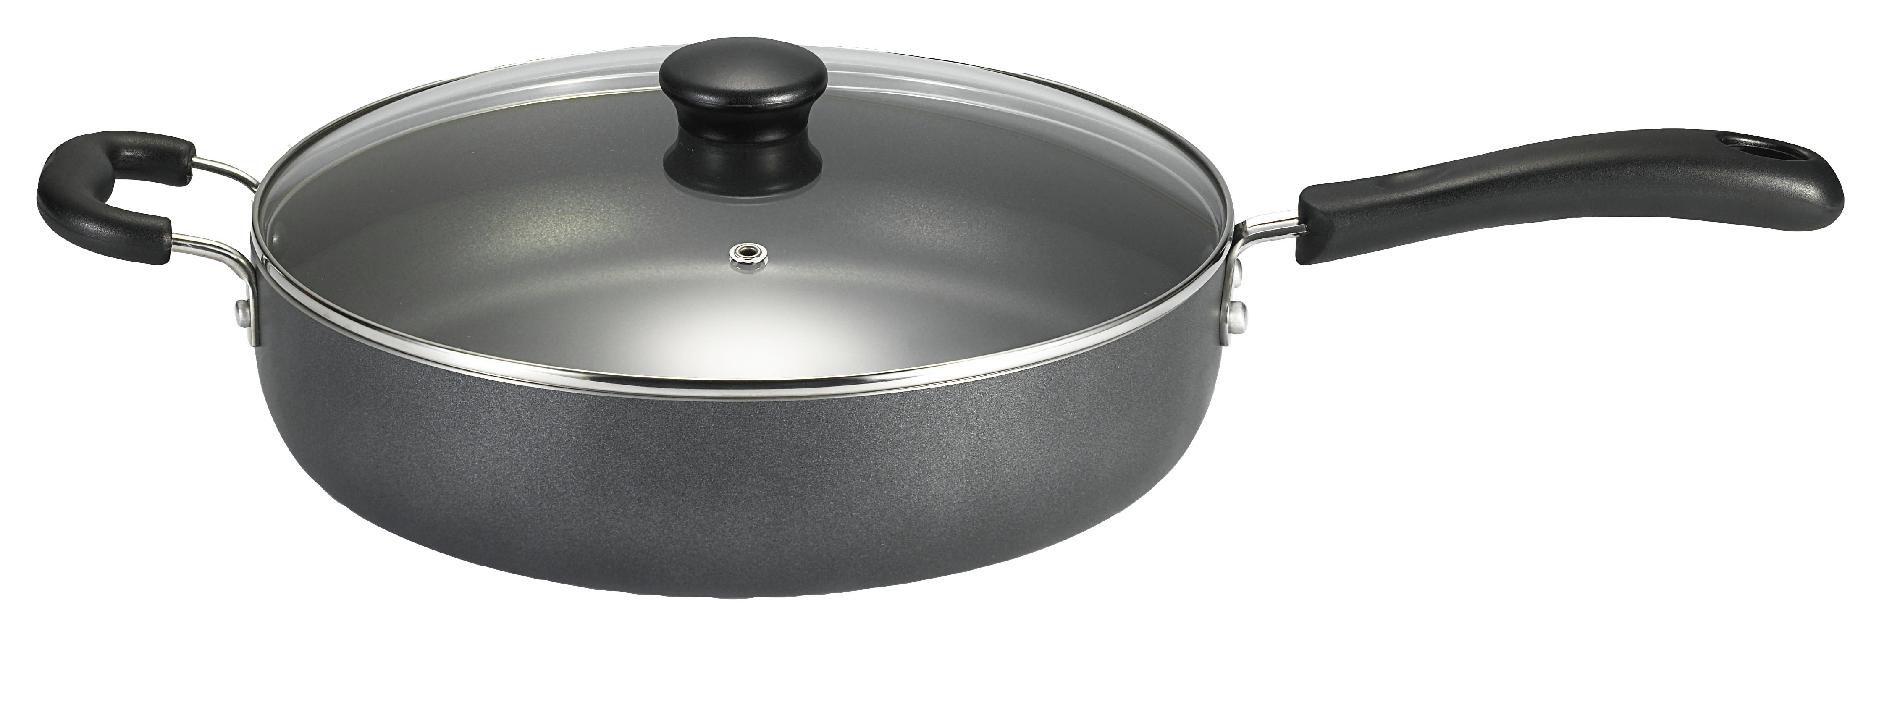 T-fal 5 quart Jumbo Covered Cooker